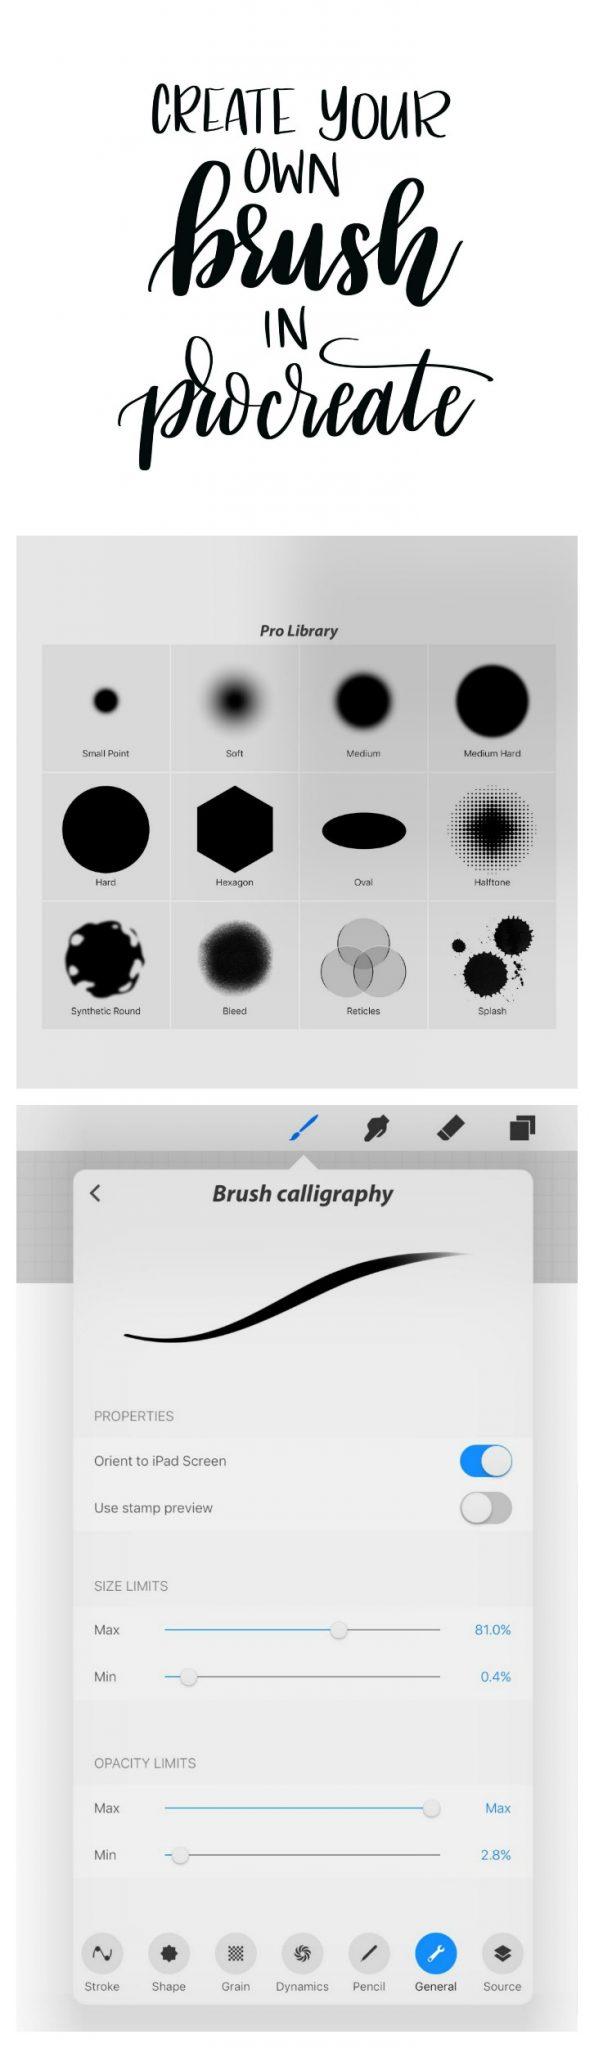 Digital Hand Lettering: Create a Procreate Brush Pen